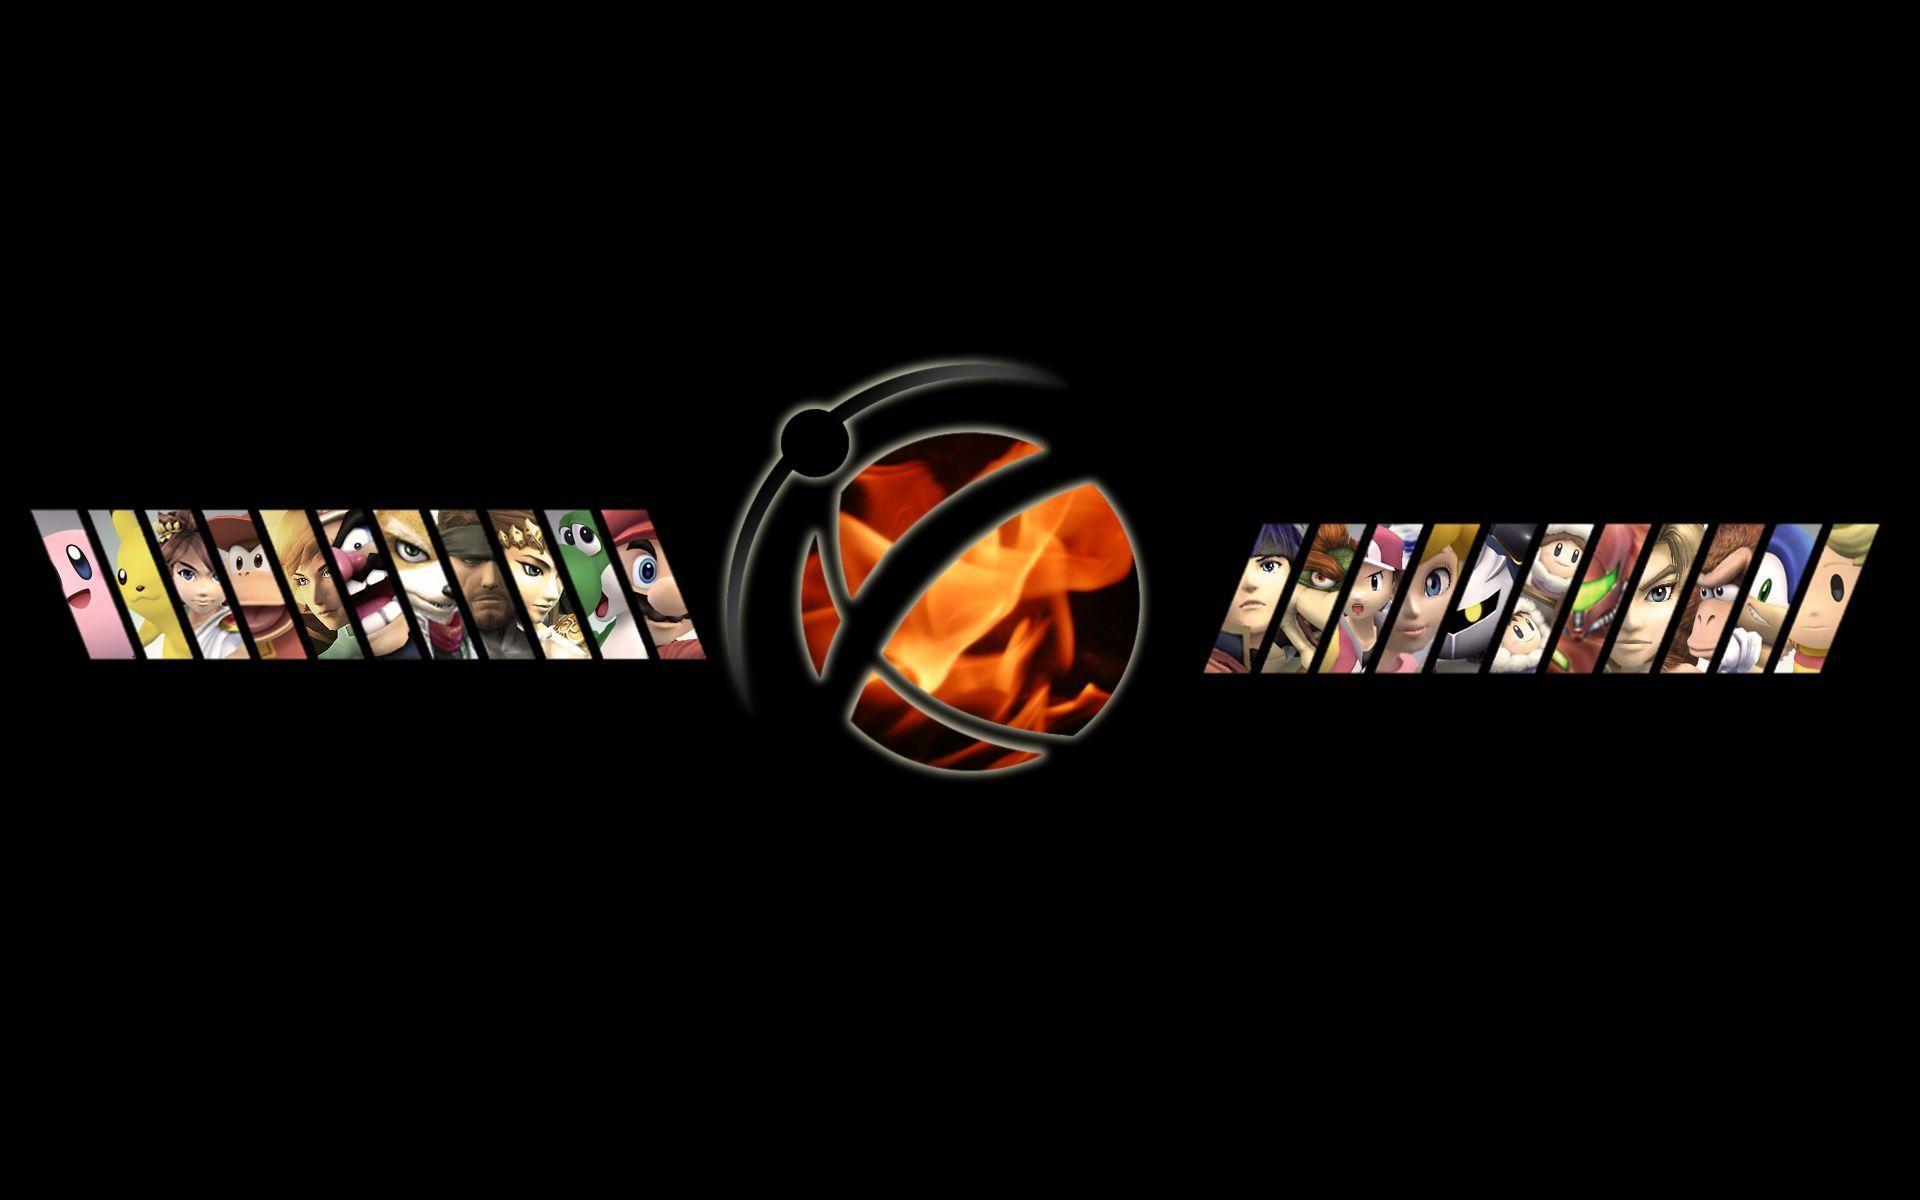 Gaming Background Hd <b>Wallpaper 900×480</b> Photo | Background .